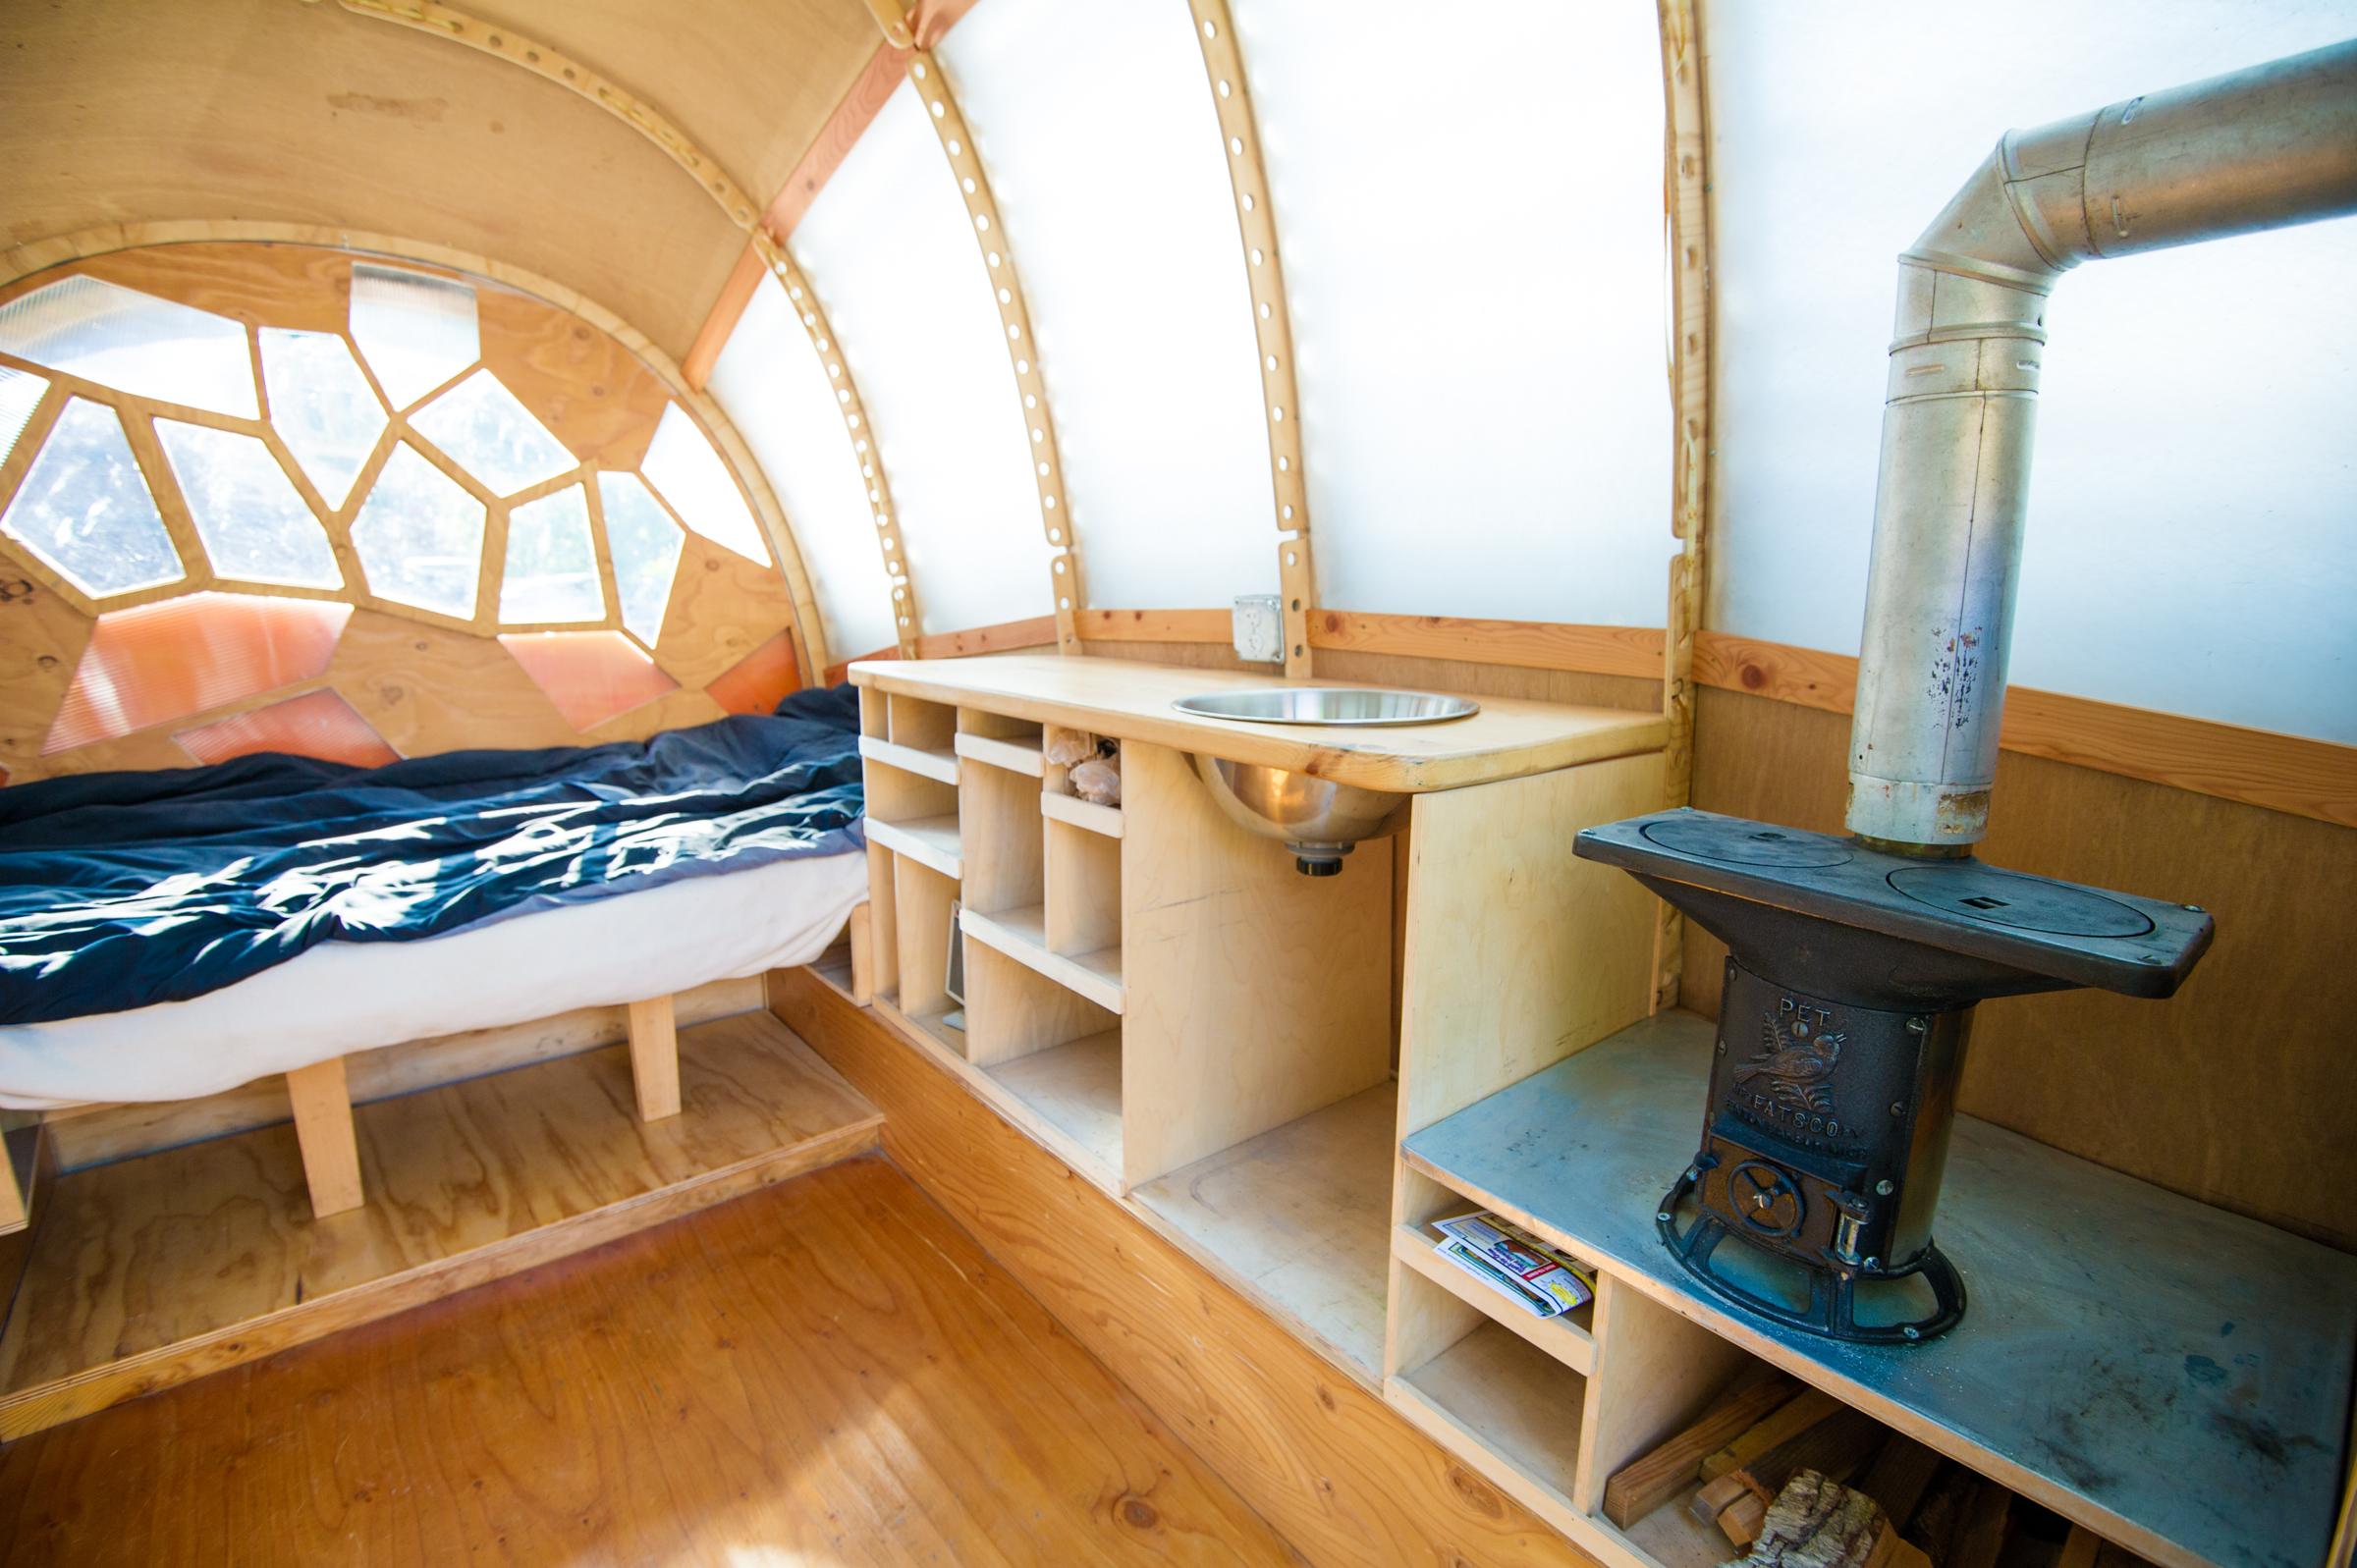 02_OTIS Interior.jpg